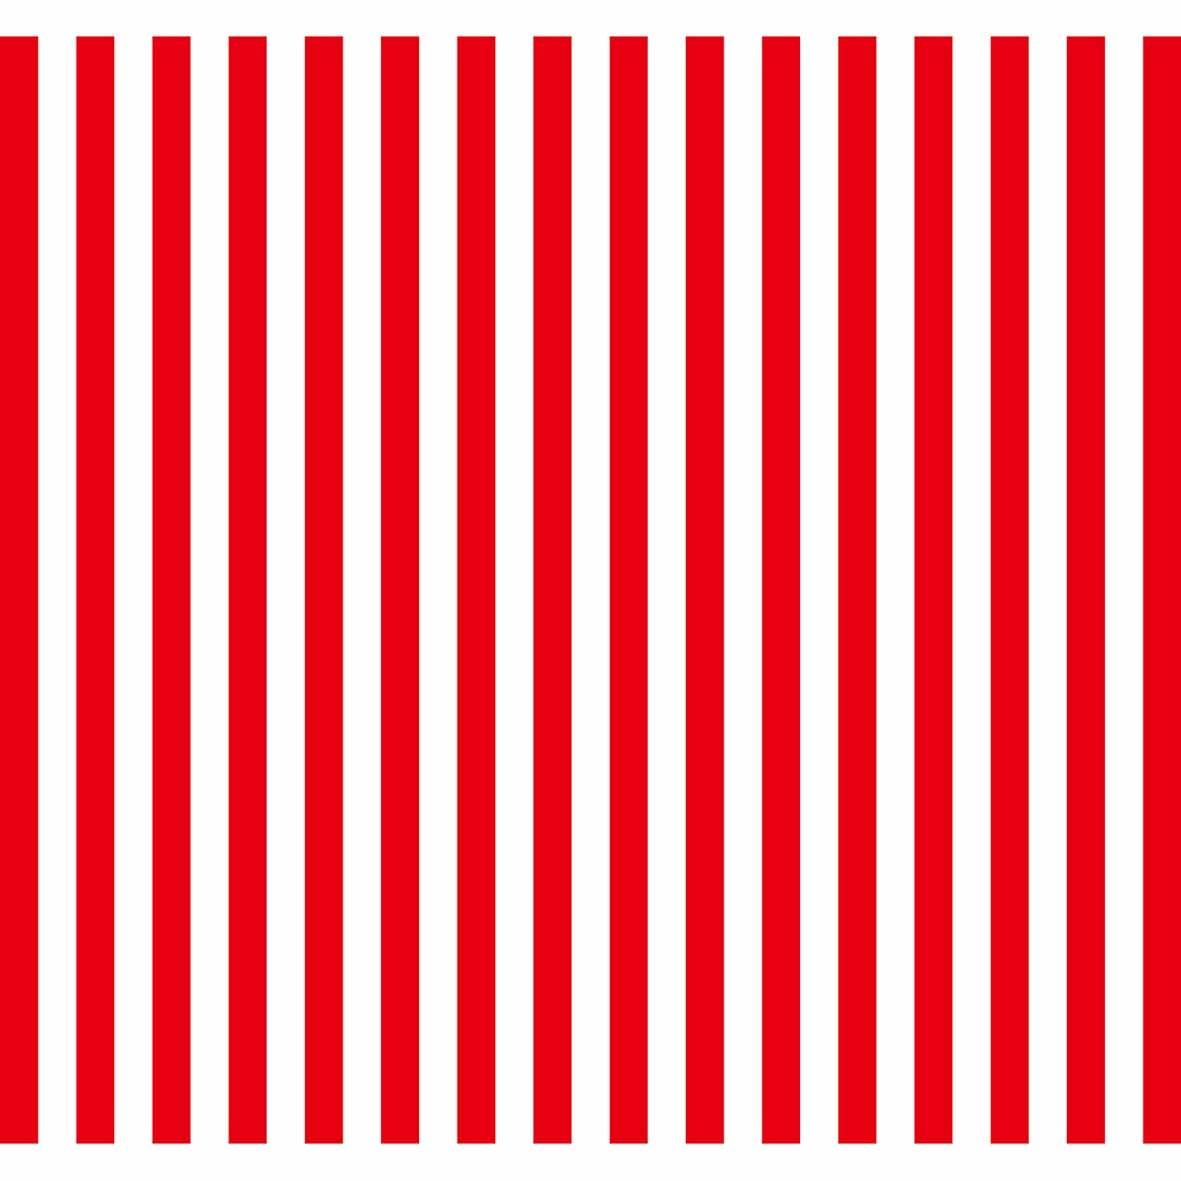 Allenjoy vinyl photographic background Red white stripes